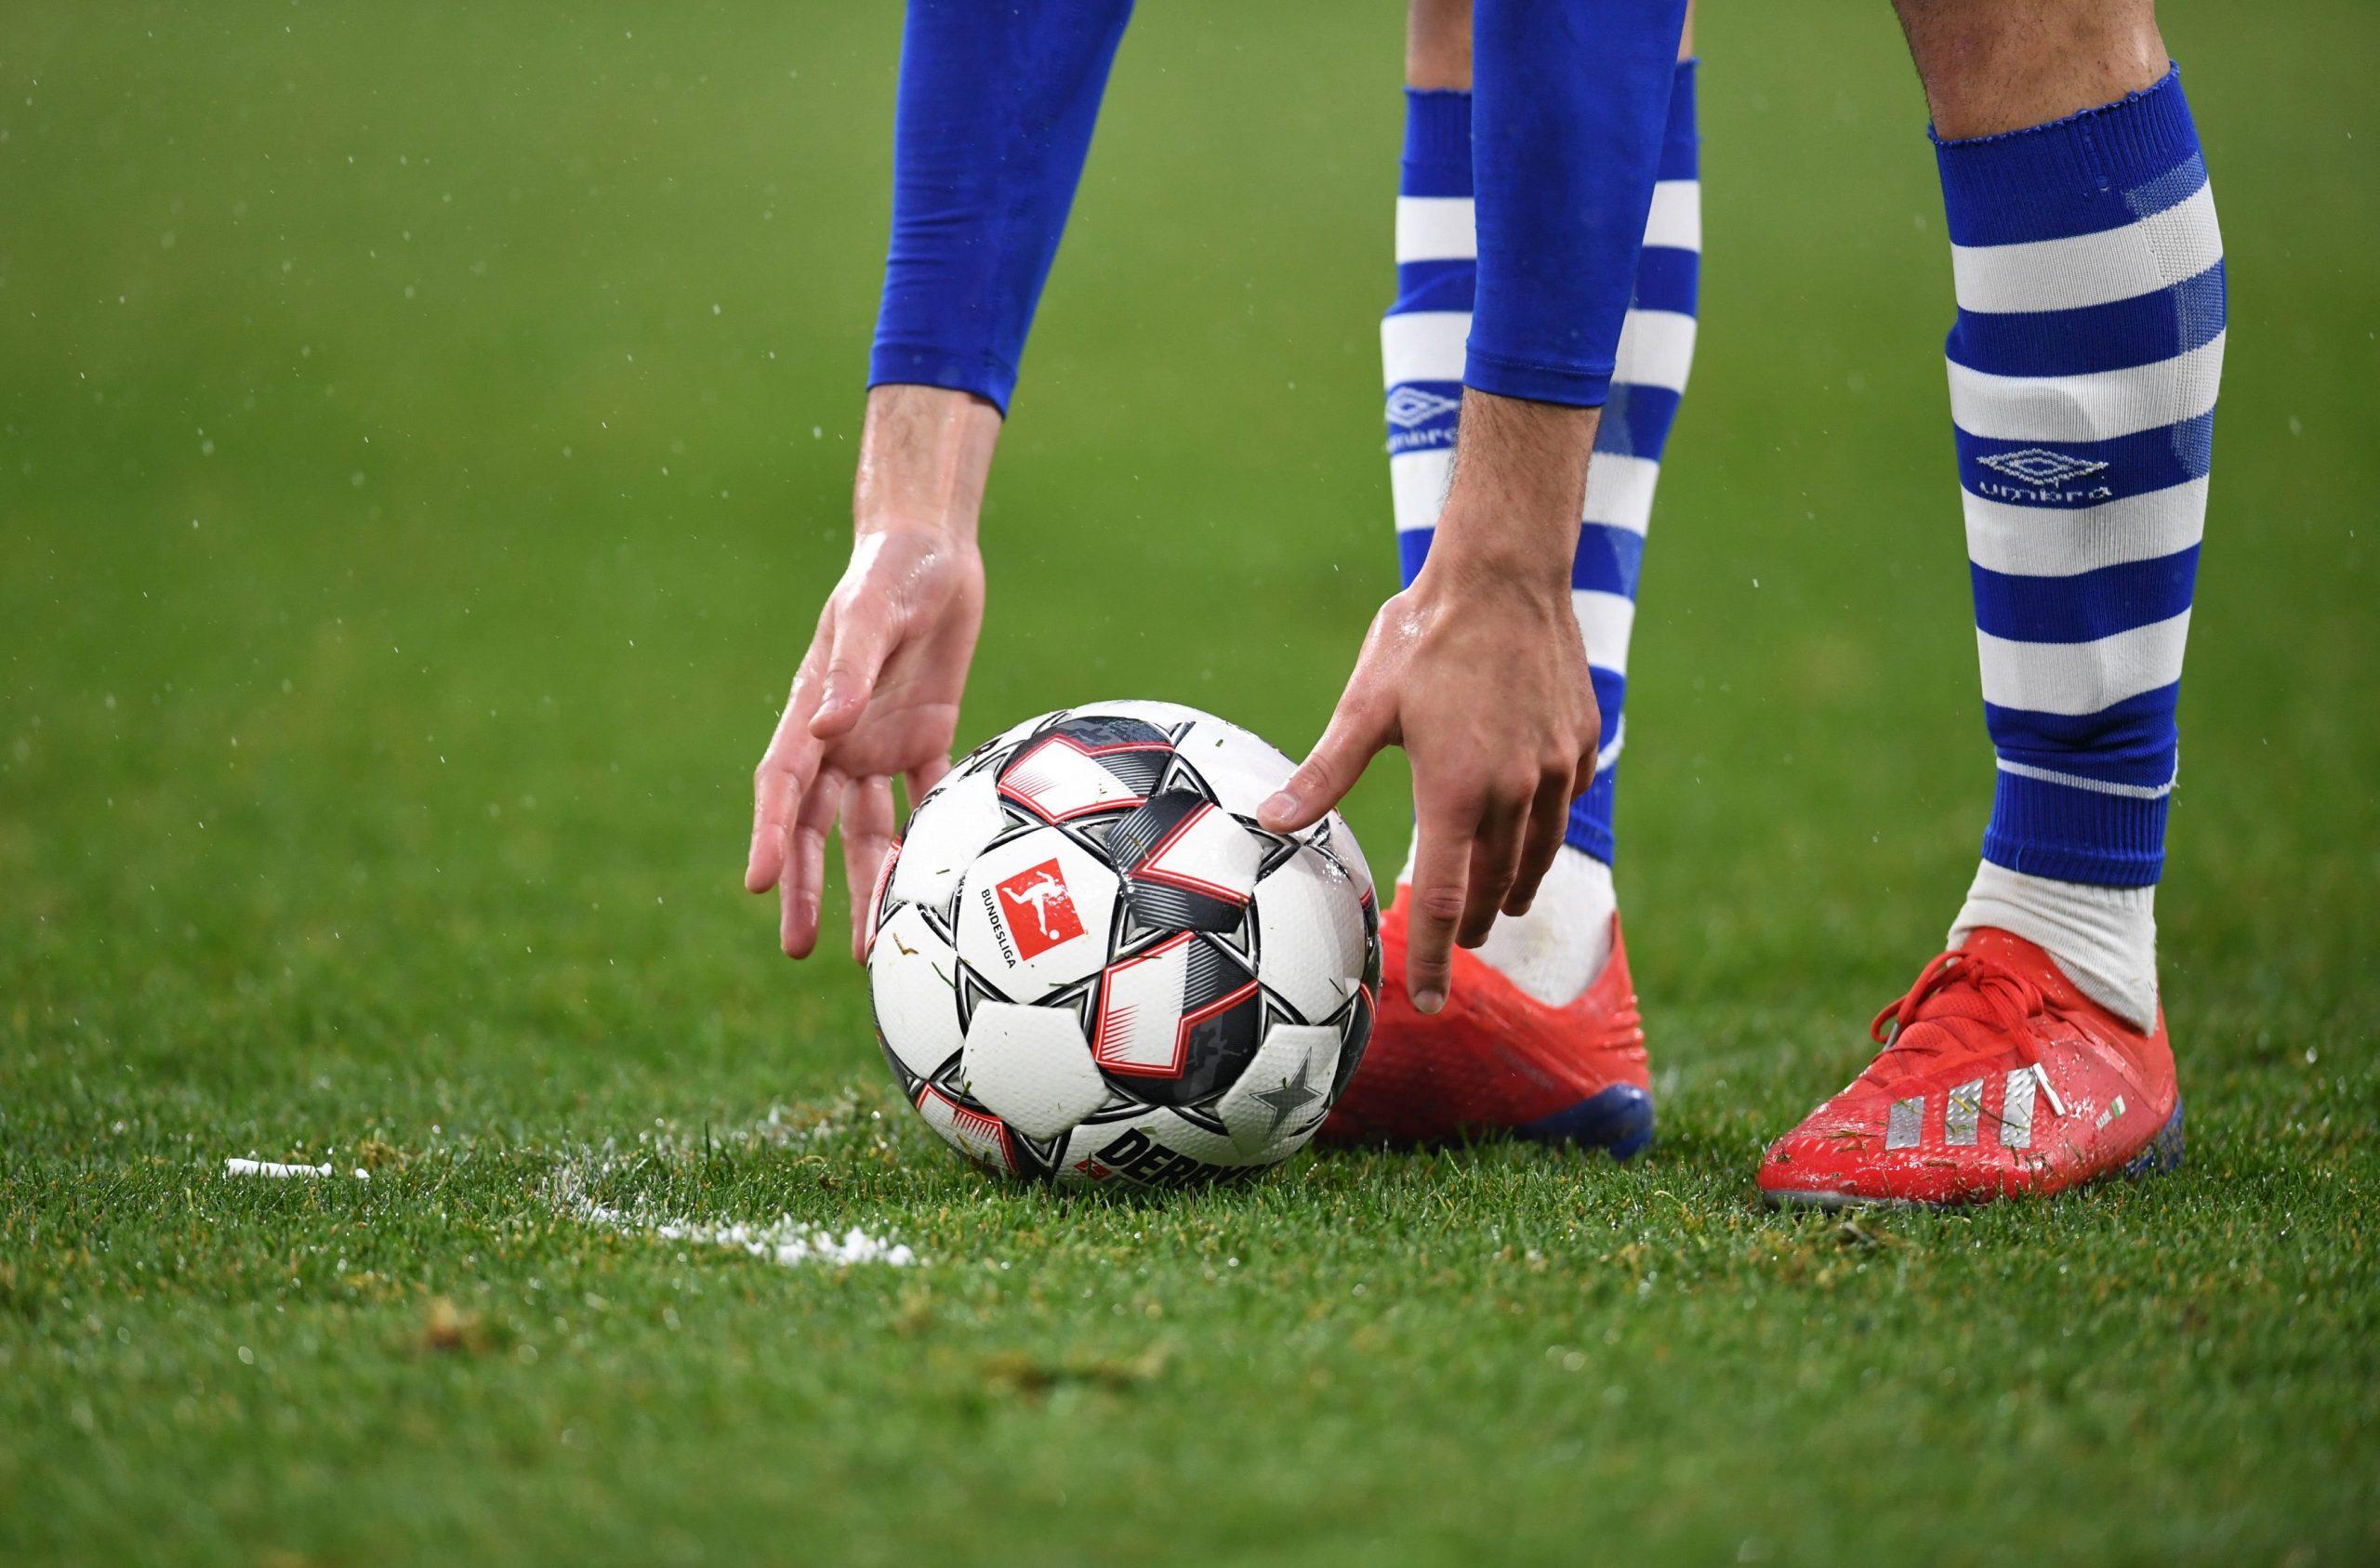 Bundesliga Fixtures 2020 & Rescheduled Dates: Date, Time, Kick-off for Bundesliga Calendar